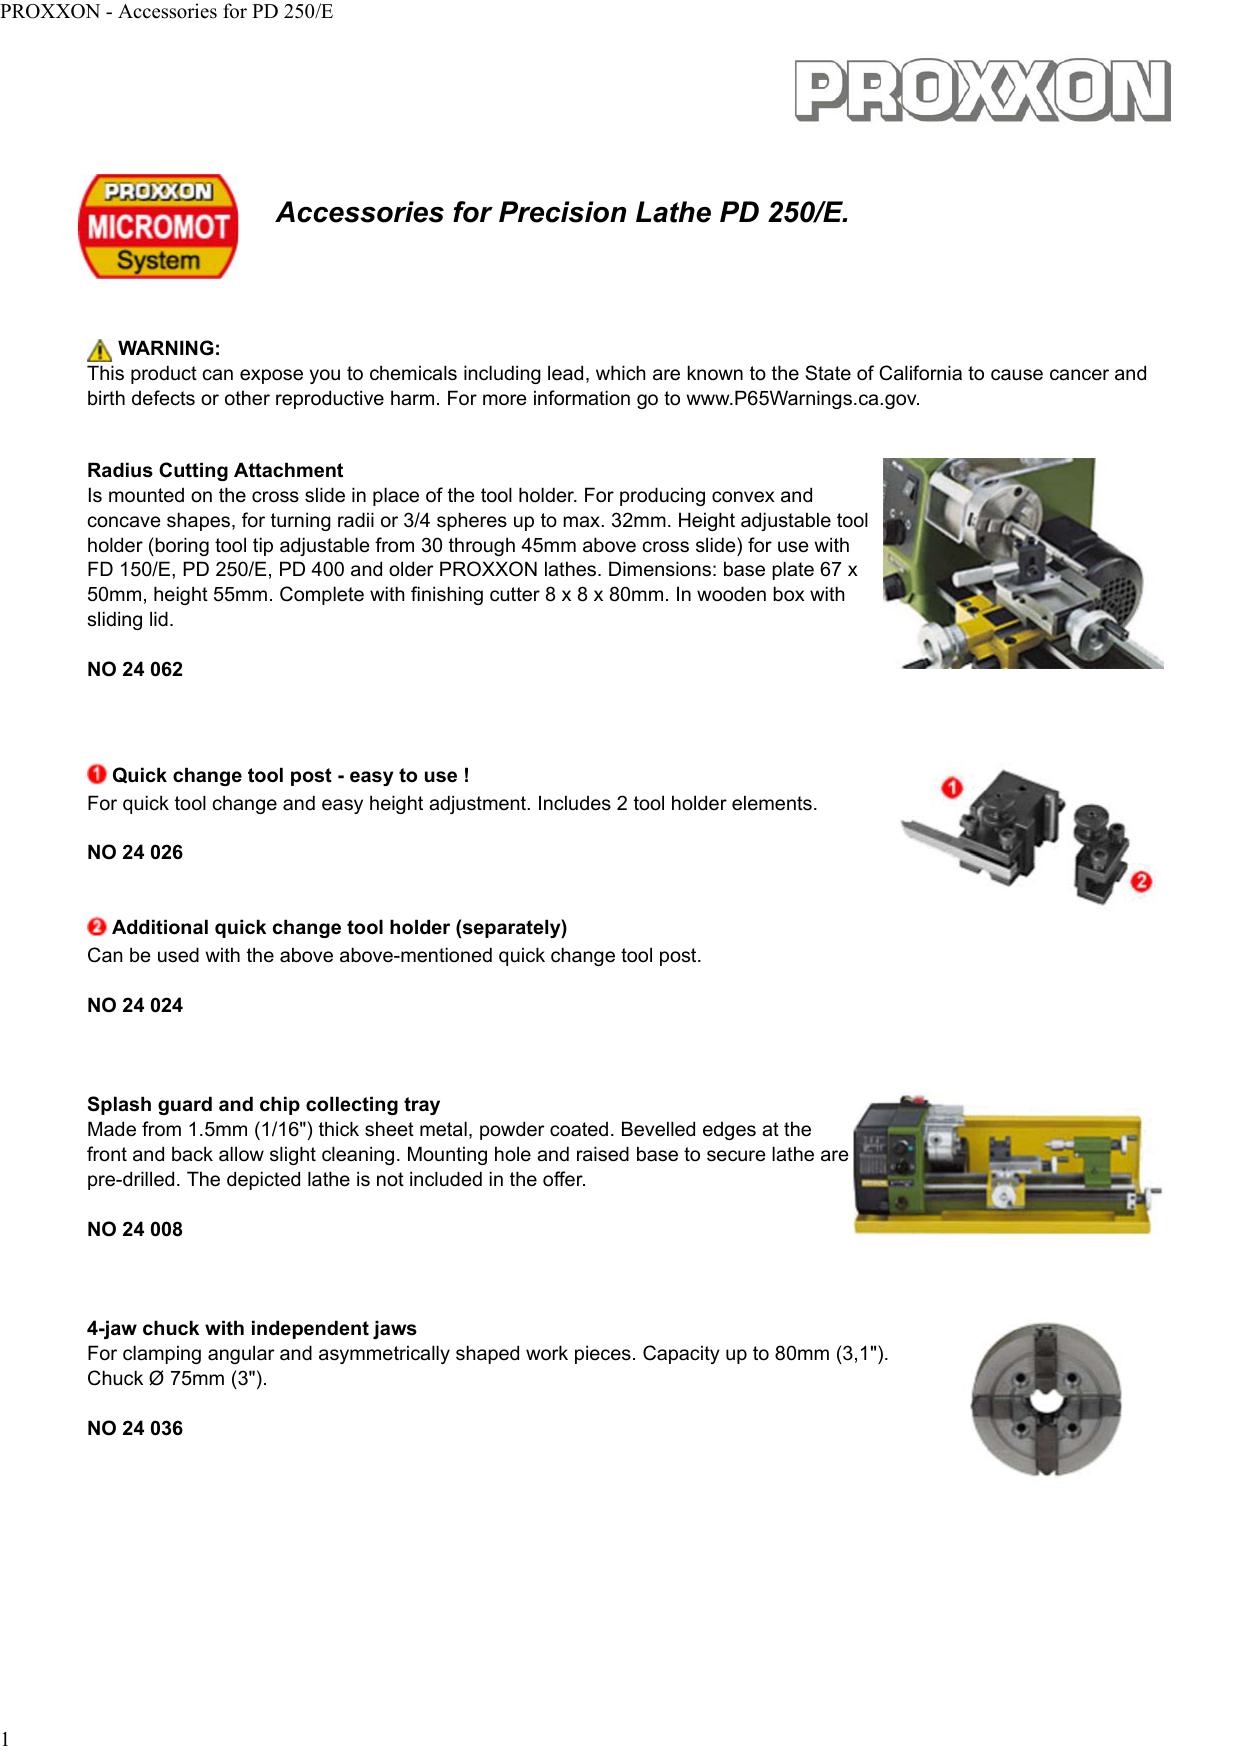 Accessories for Precision Lathe PD 250/E  | manualzz com